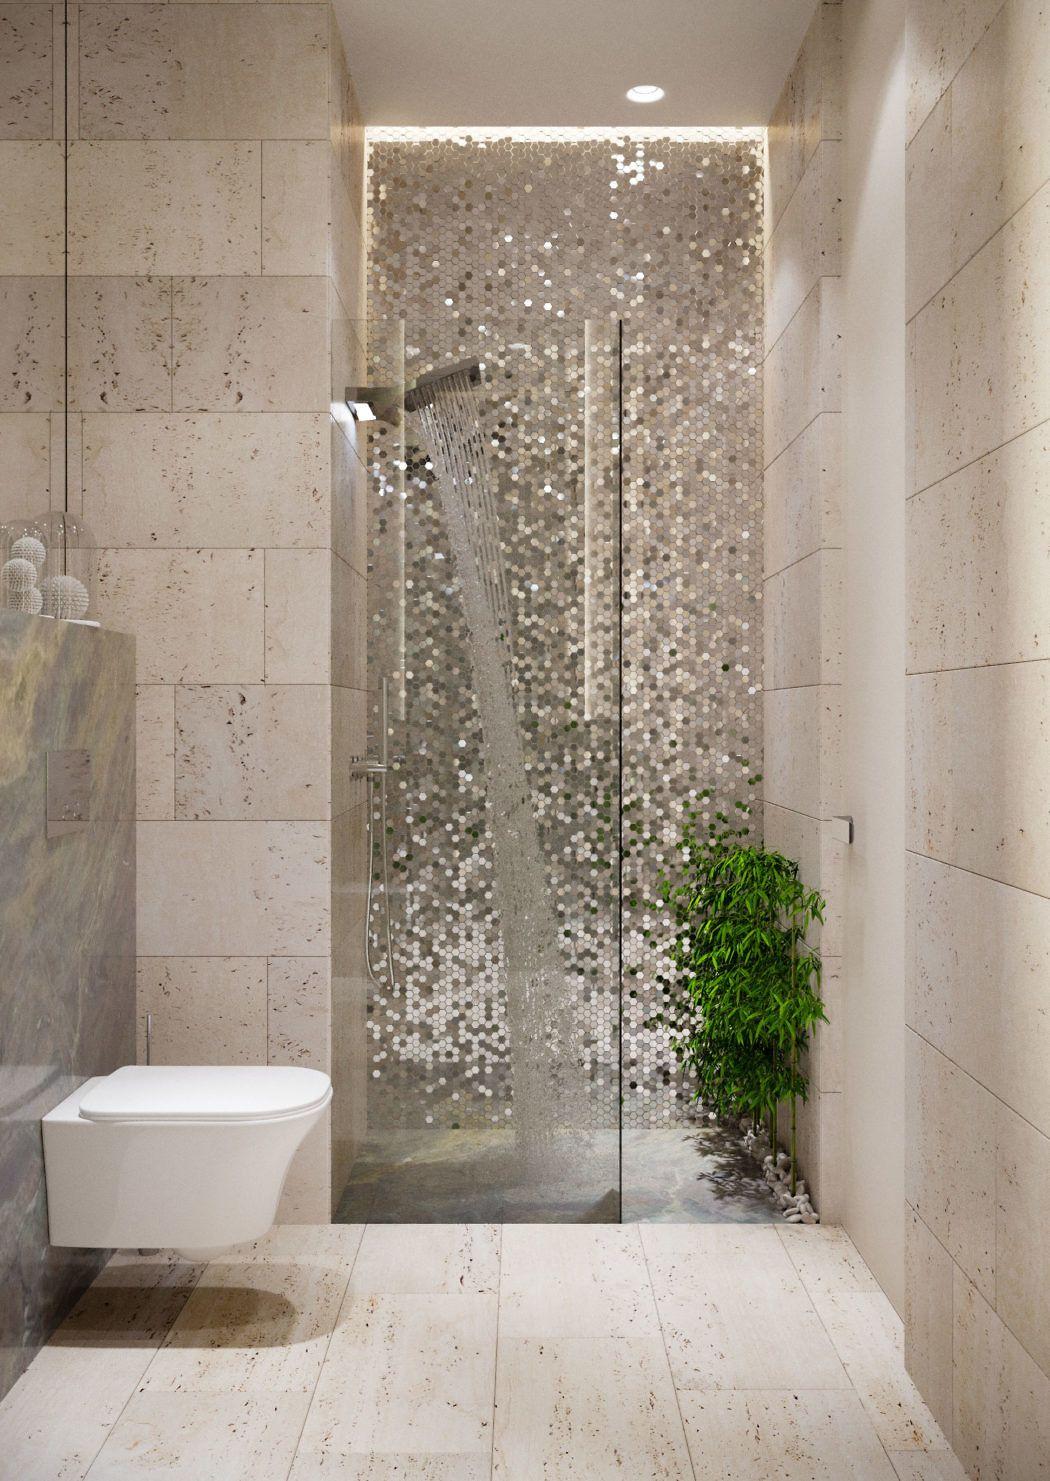 Pin By 5a Rent A Space On Salle De Bain Outdoor Bathroom Design Spa Bathroom Design Zen Bathroom Design